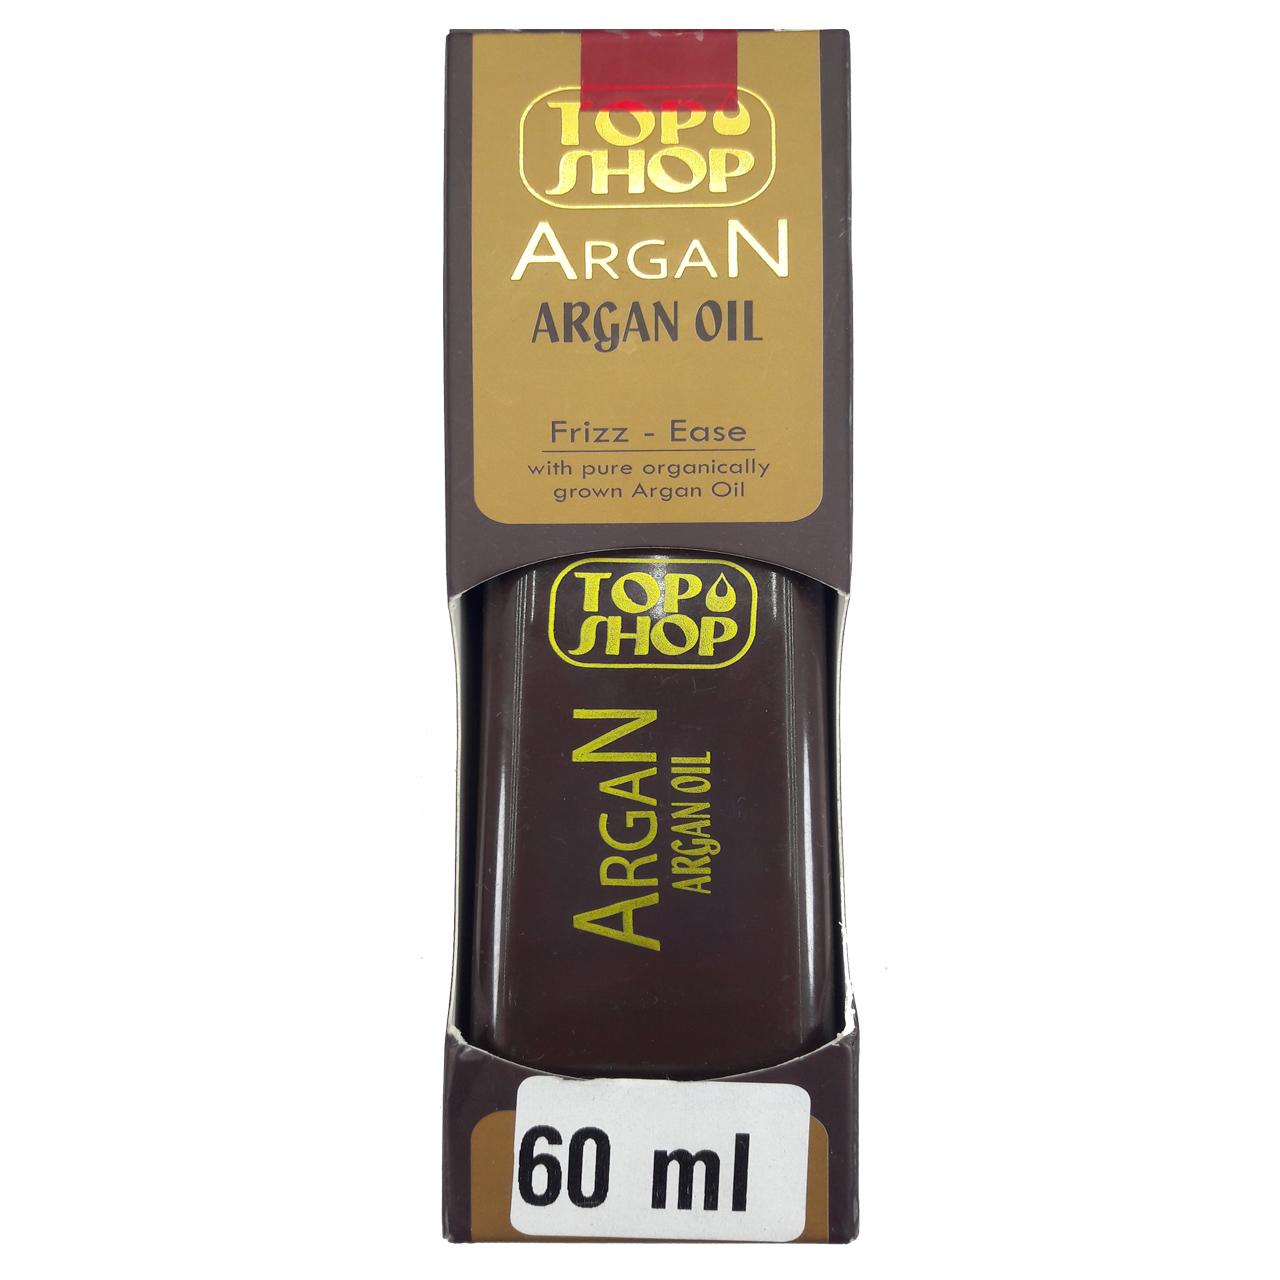 روغن آرگان خالص مدل top shop حجم 60 میلی لیتر